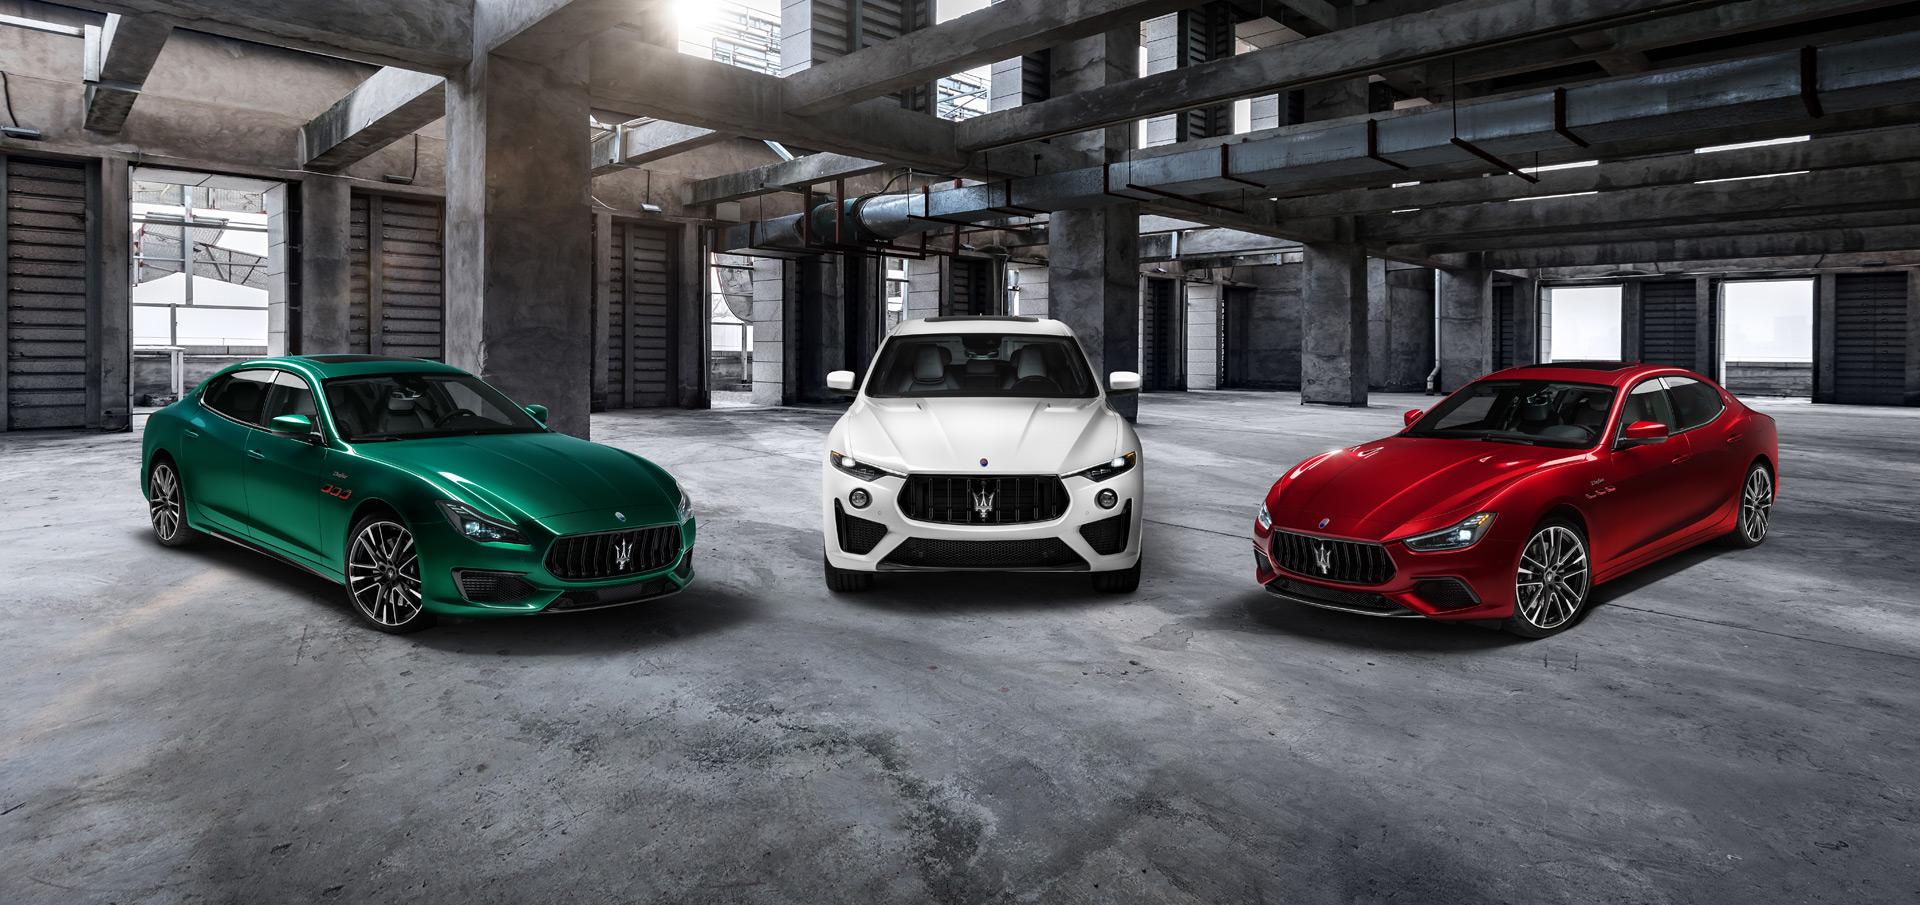 Hardcore Trofeo versions of Maserati Ghibli, Quattroporte arrive with V-8 power